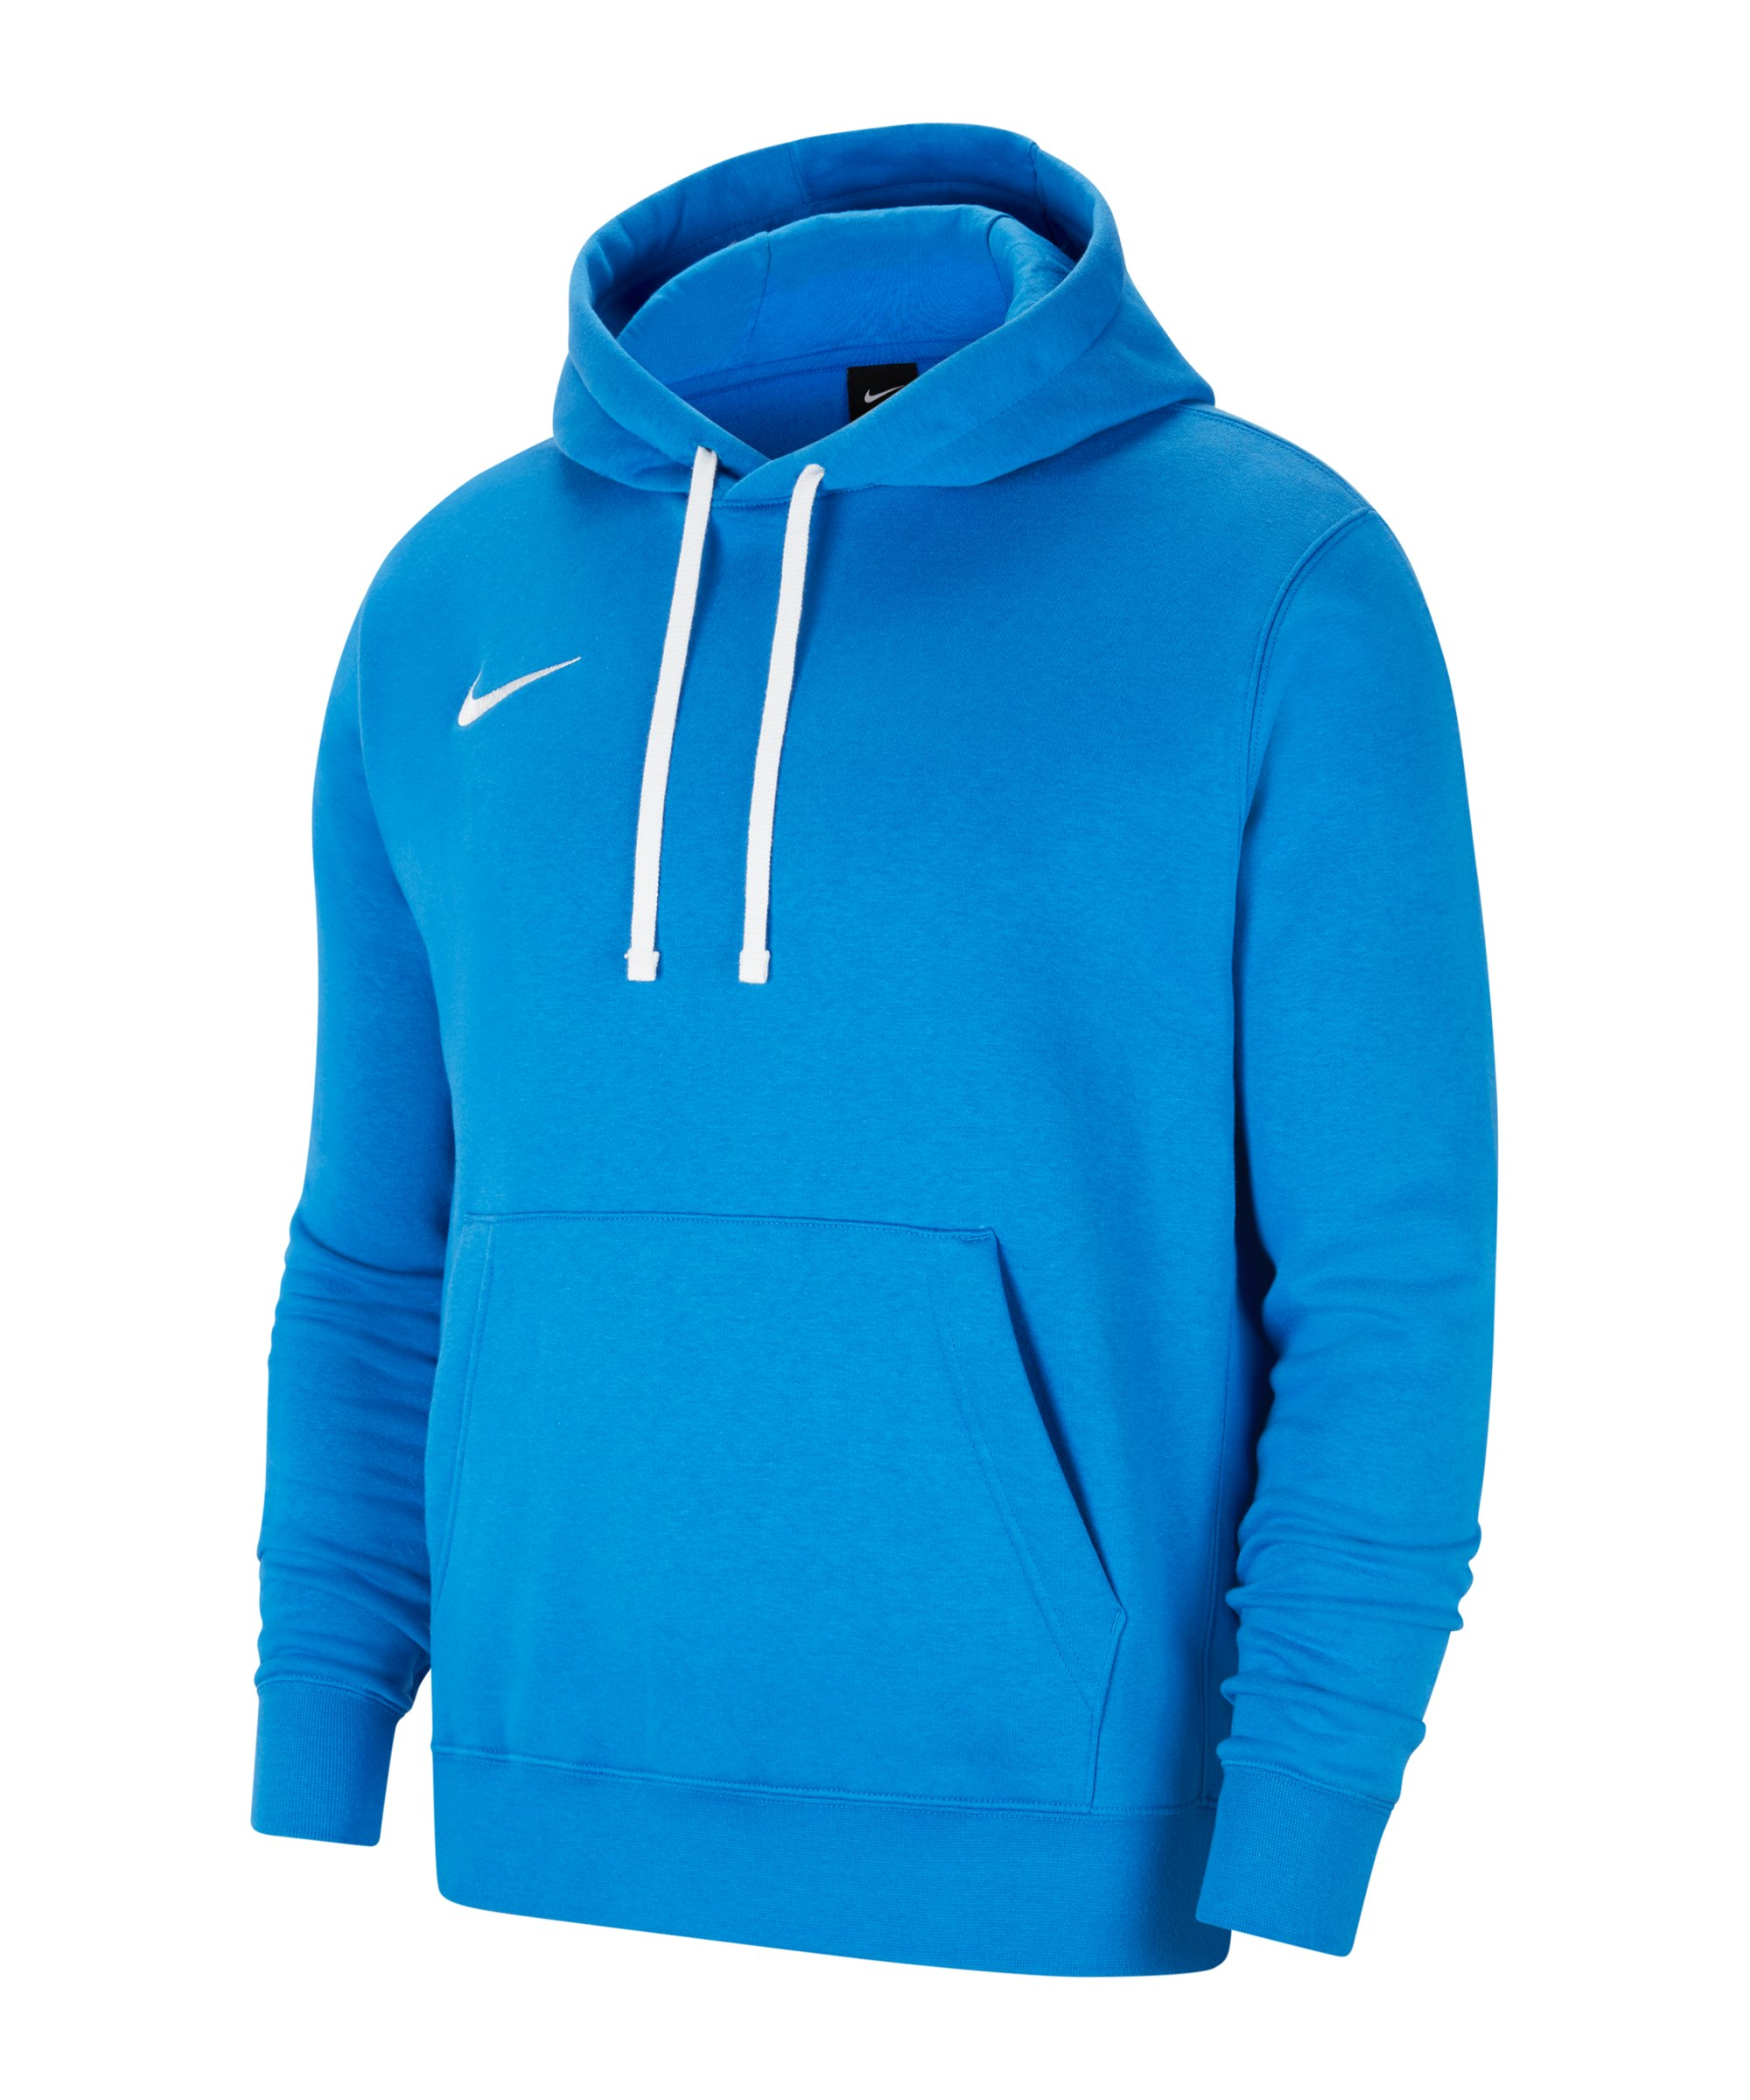 Nike Park 20 Fleece Hoody Blau Weiss F463 - blau